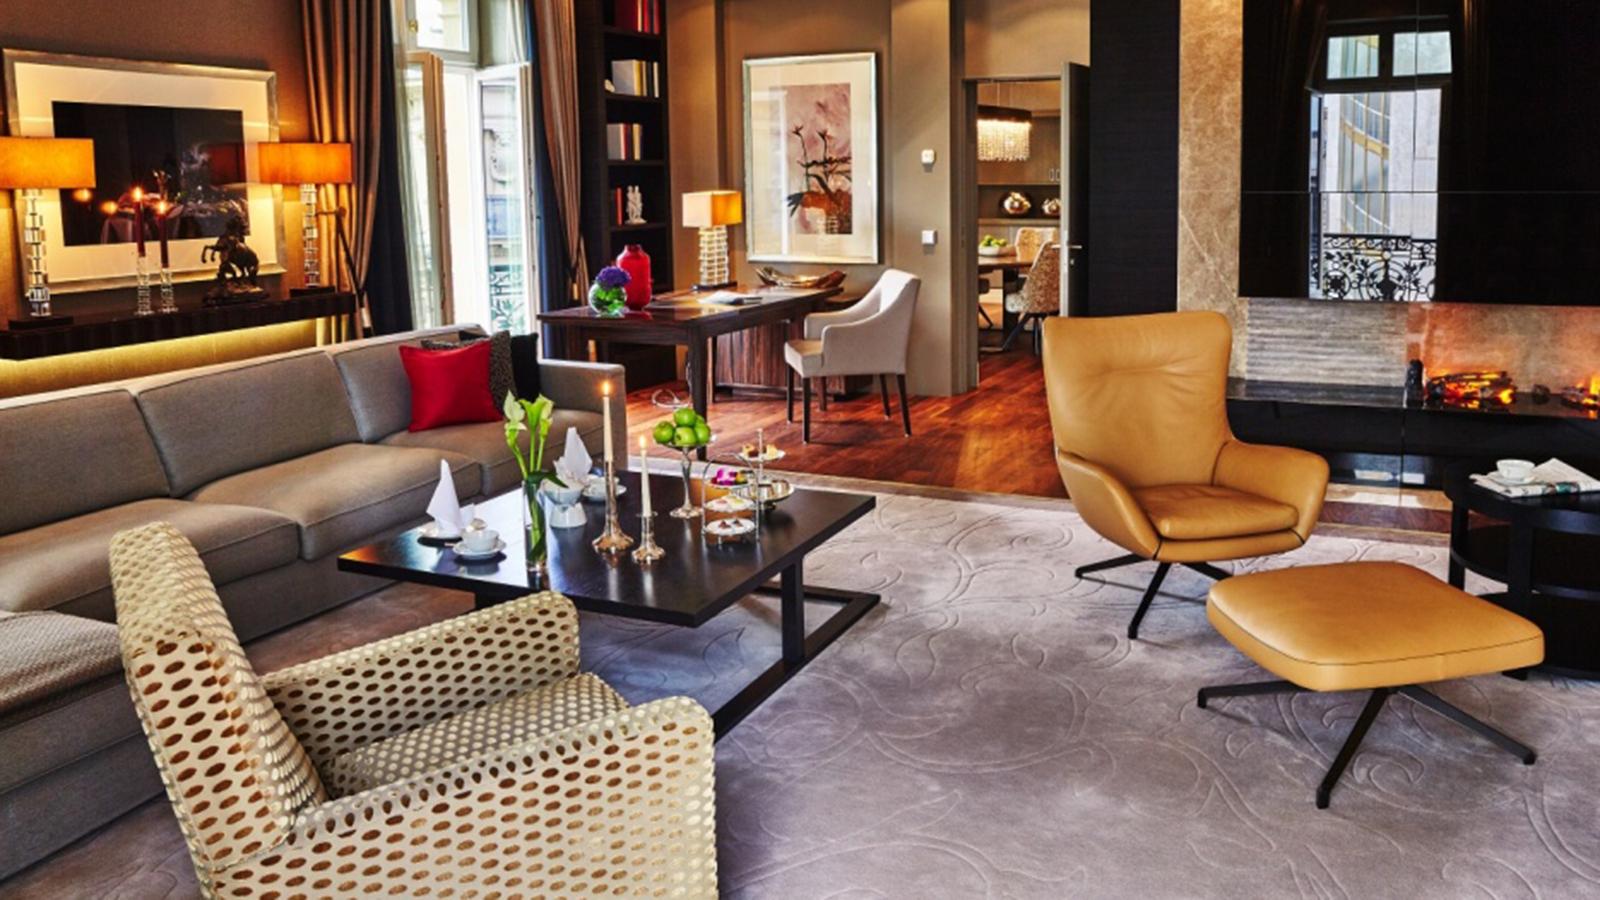 ancona chairs durban hotels - photo#16